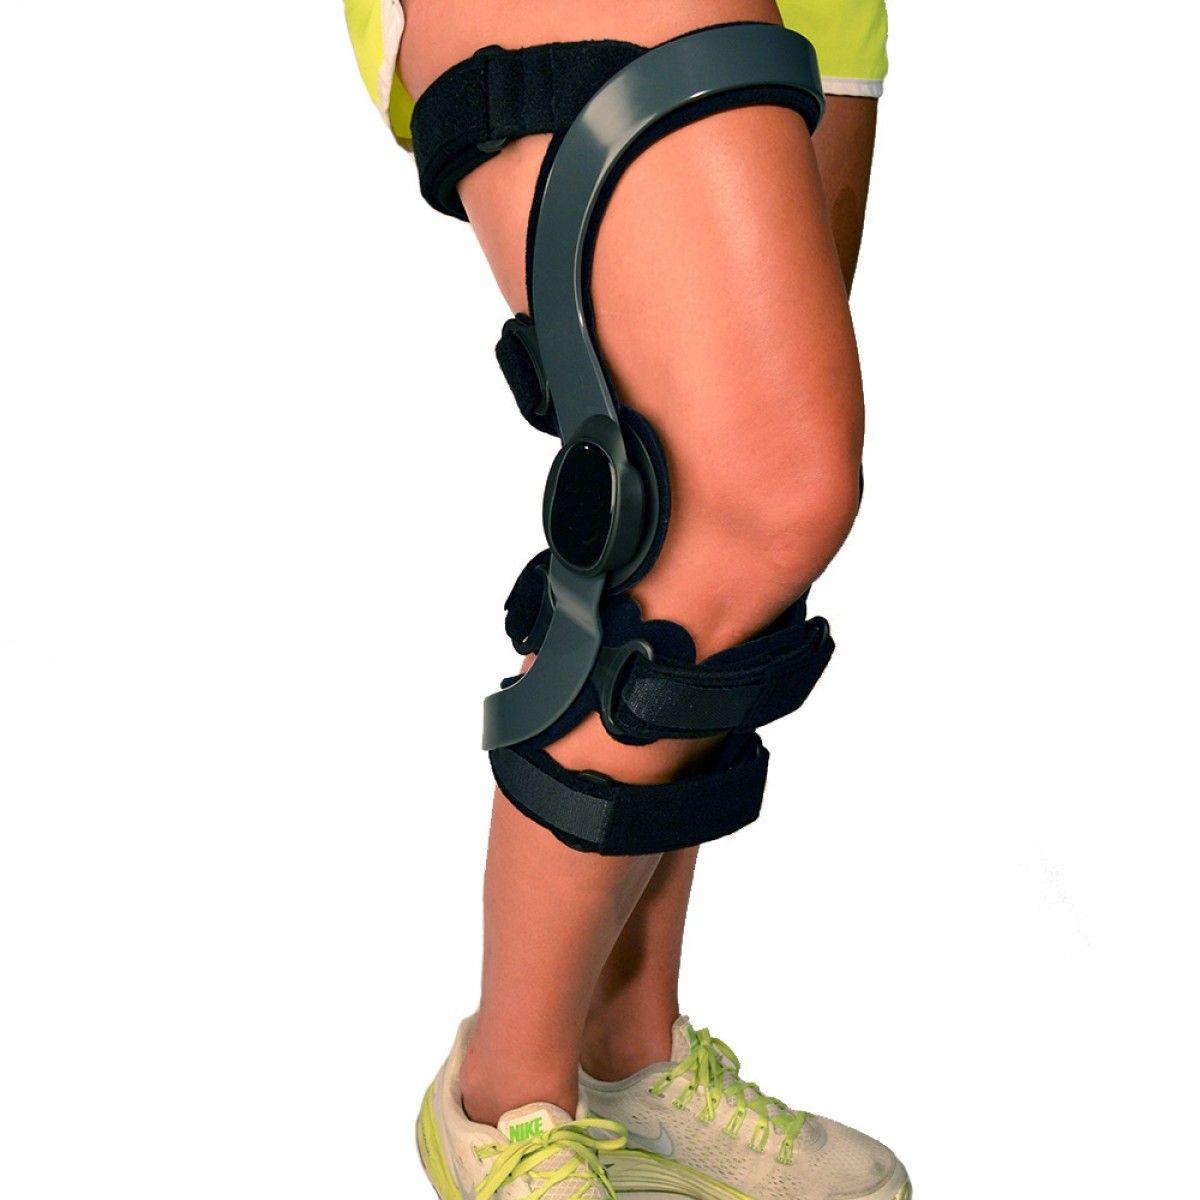 Acl Knee Brace Functional Prophylactic Brace For Ligament Tears Acl Knee Brace Acl Knee Knee Brace